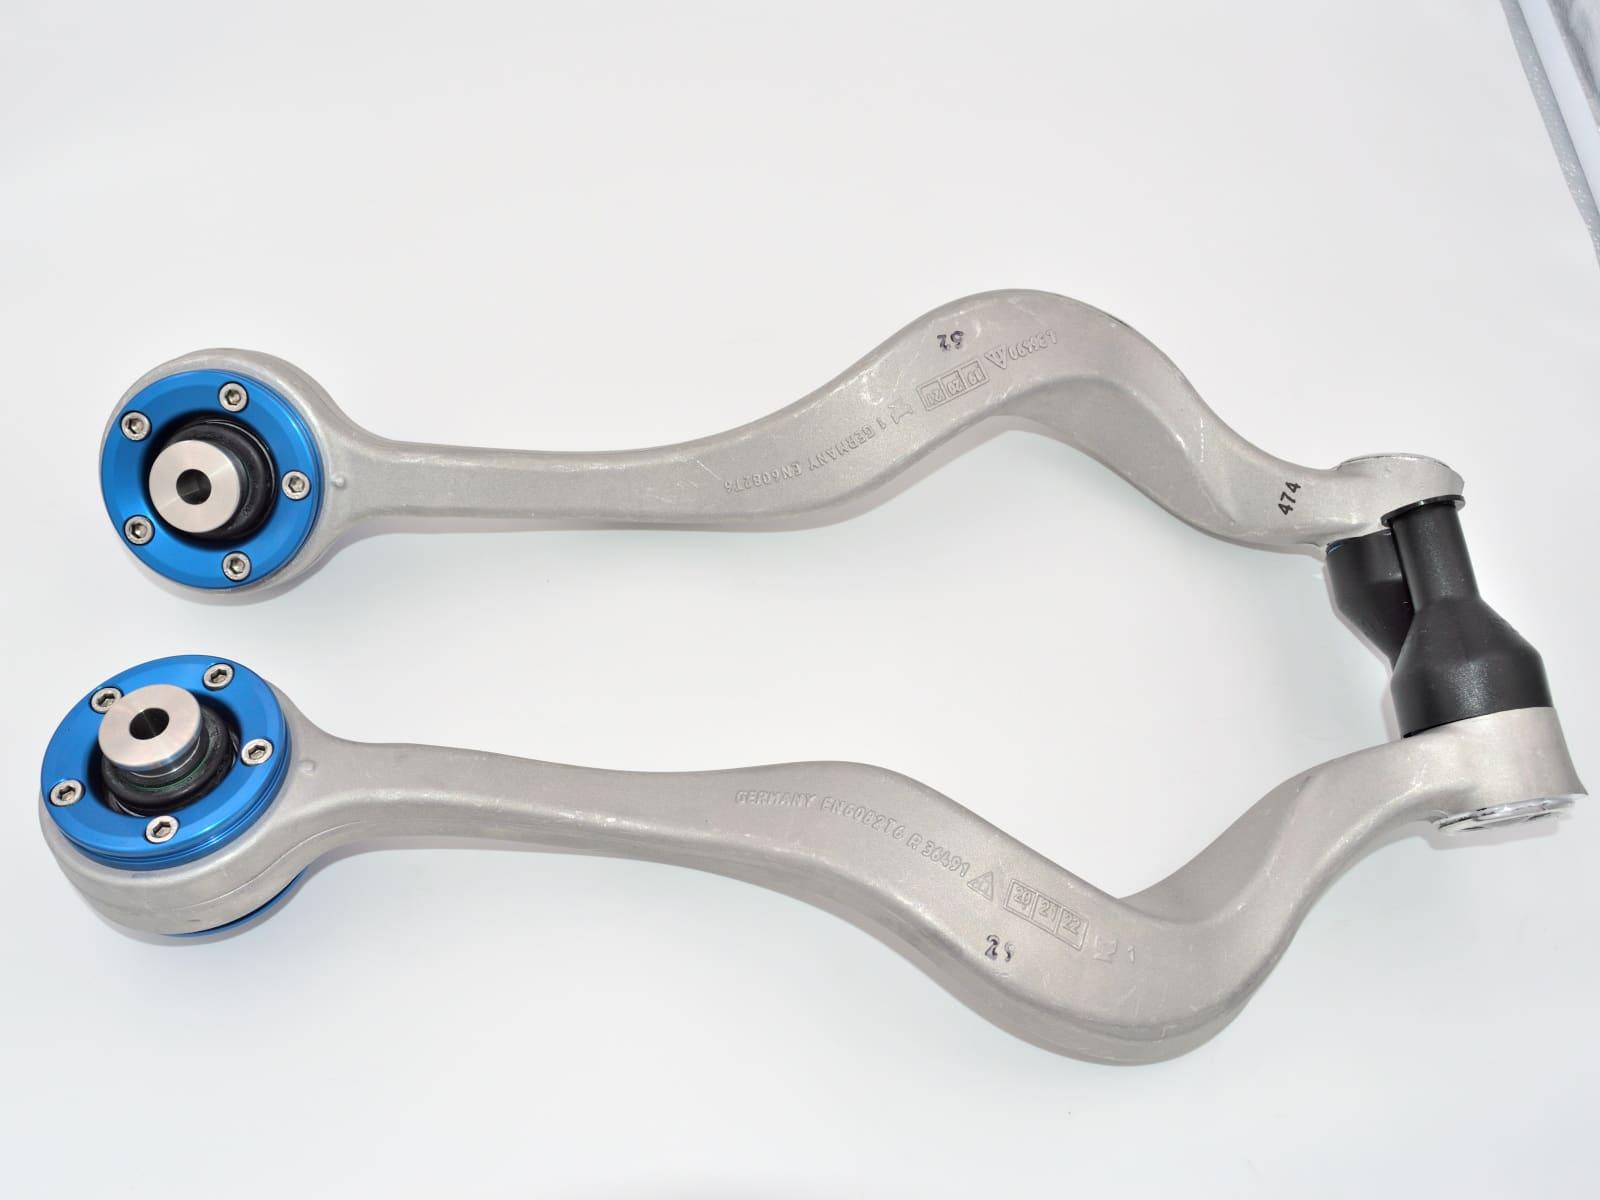 GAS BMW E60 Monoballs Pre-installed into New Control Arms